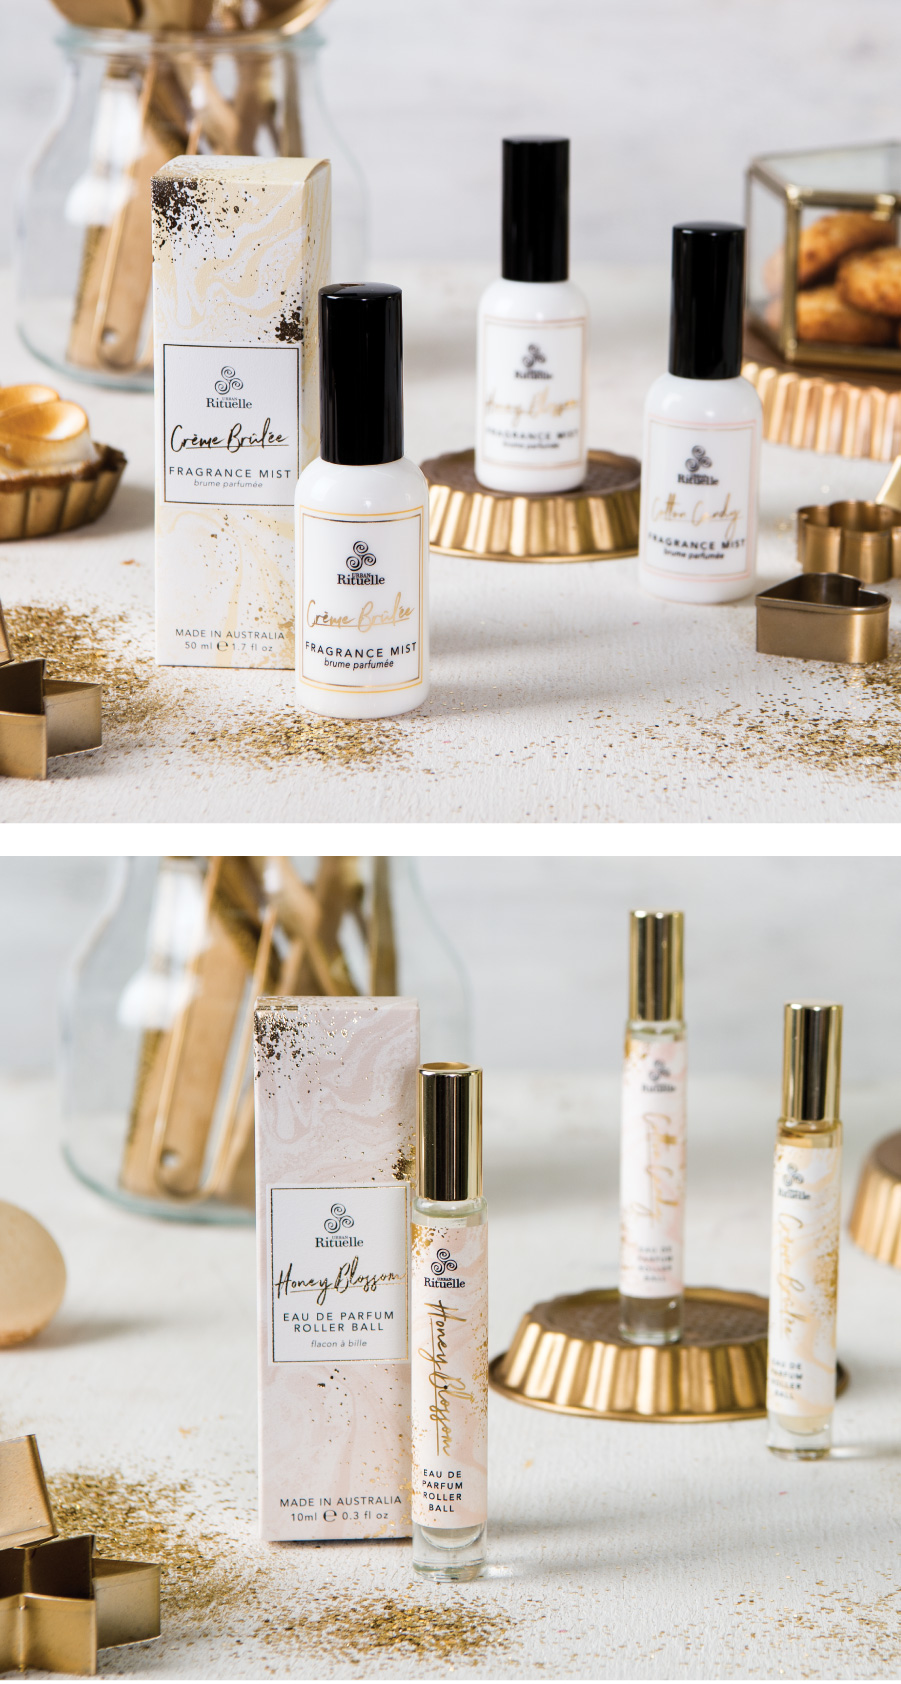 Sweet Treats Fragrance Mist